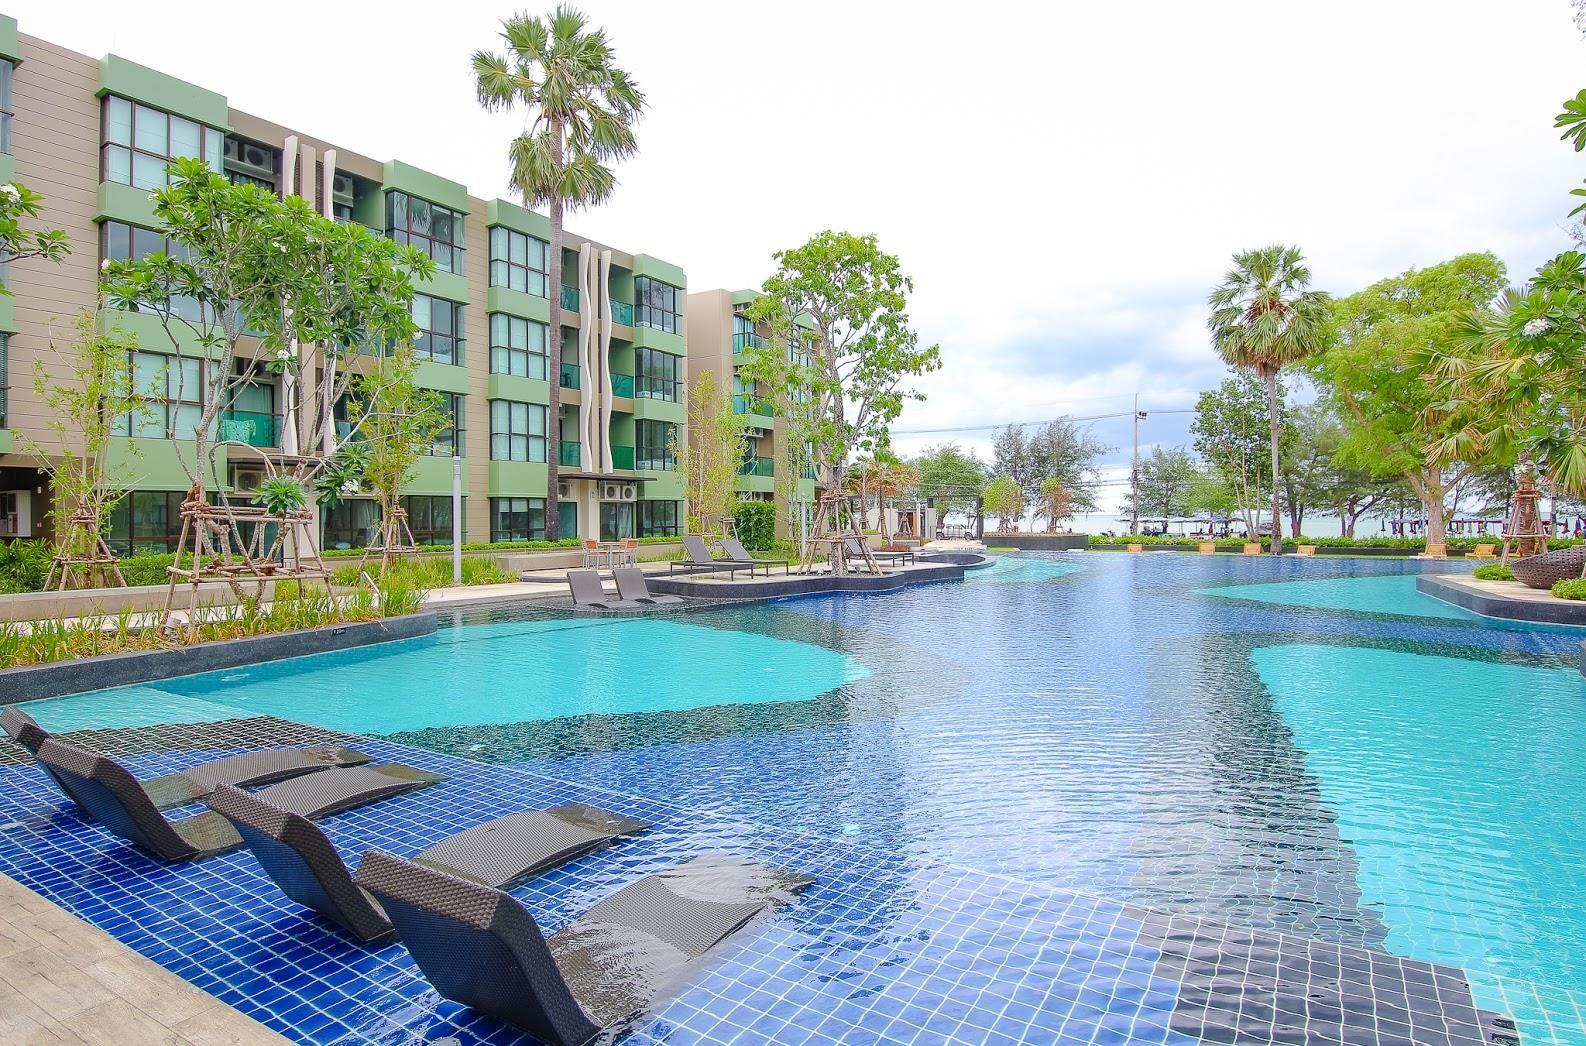 Hua Hin / Cha-am Lumpini Park beach cha-am Thailand, Asia Lumpini ...